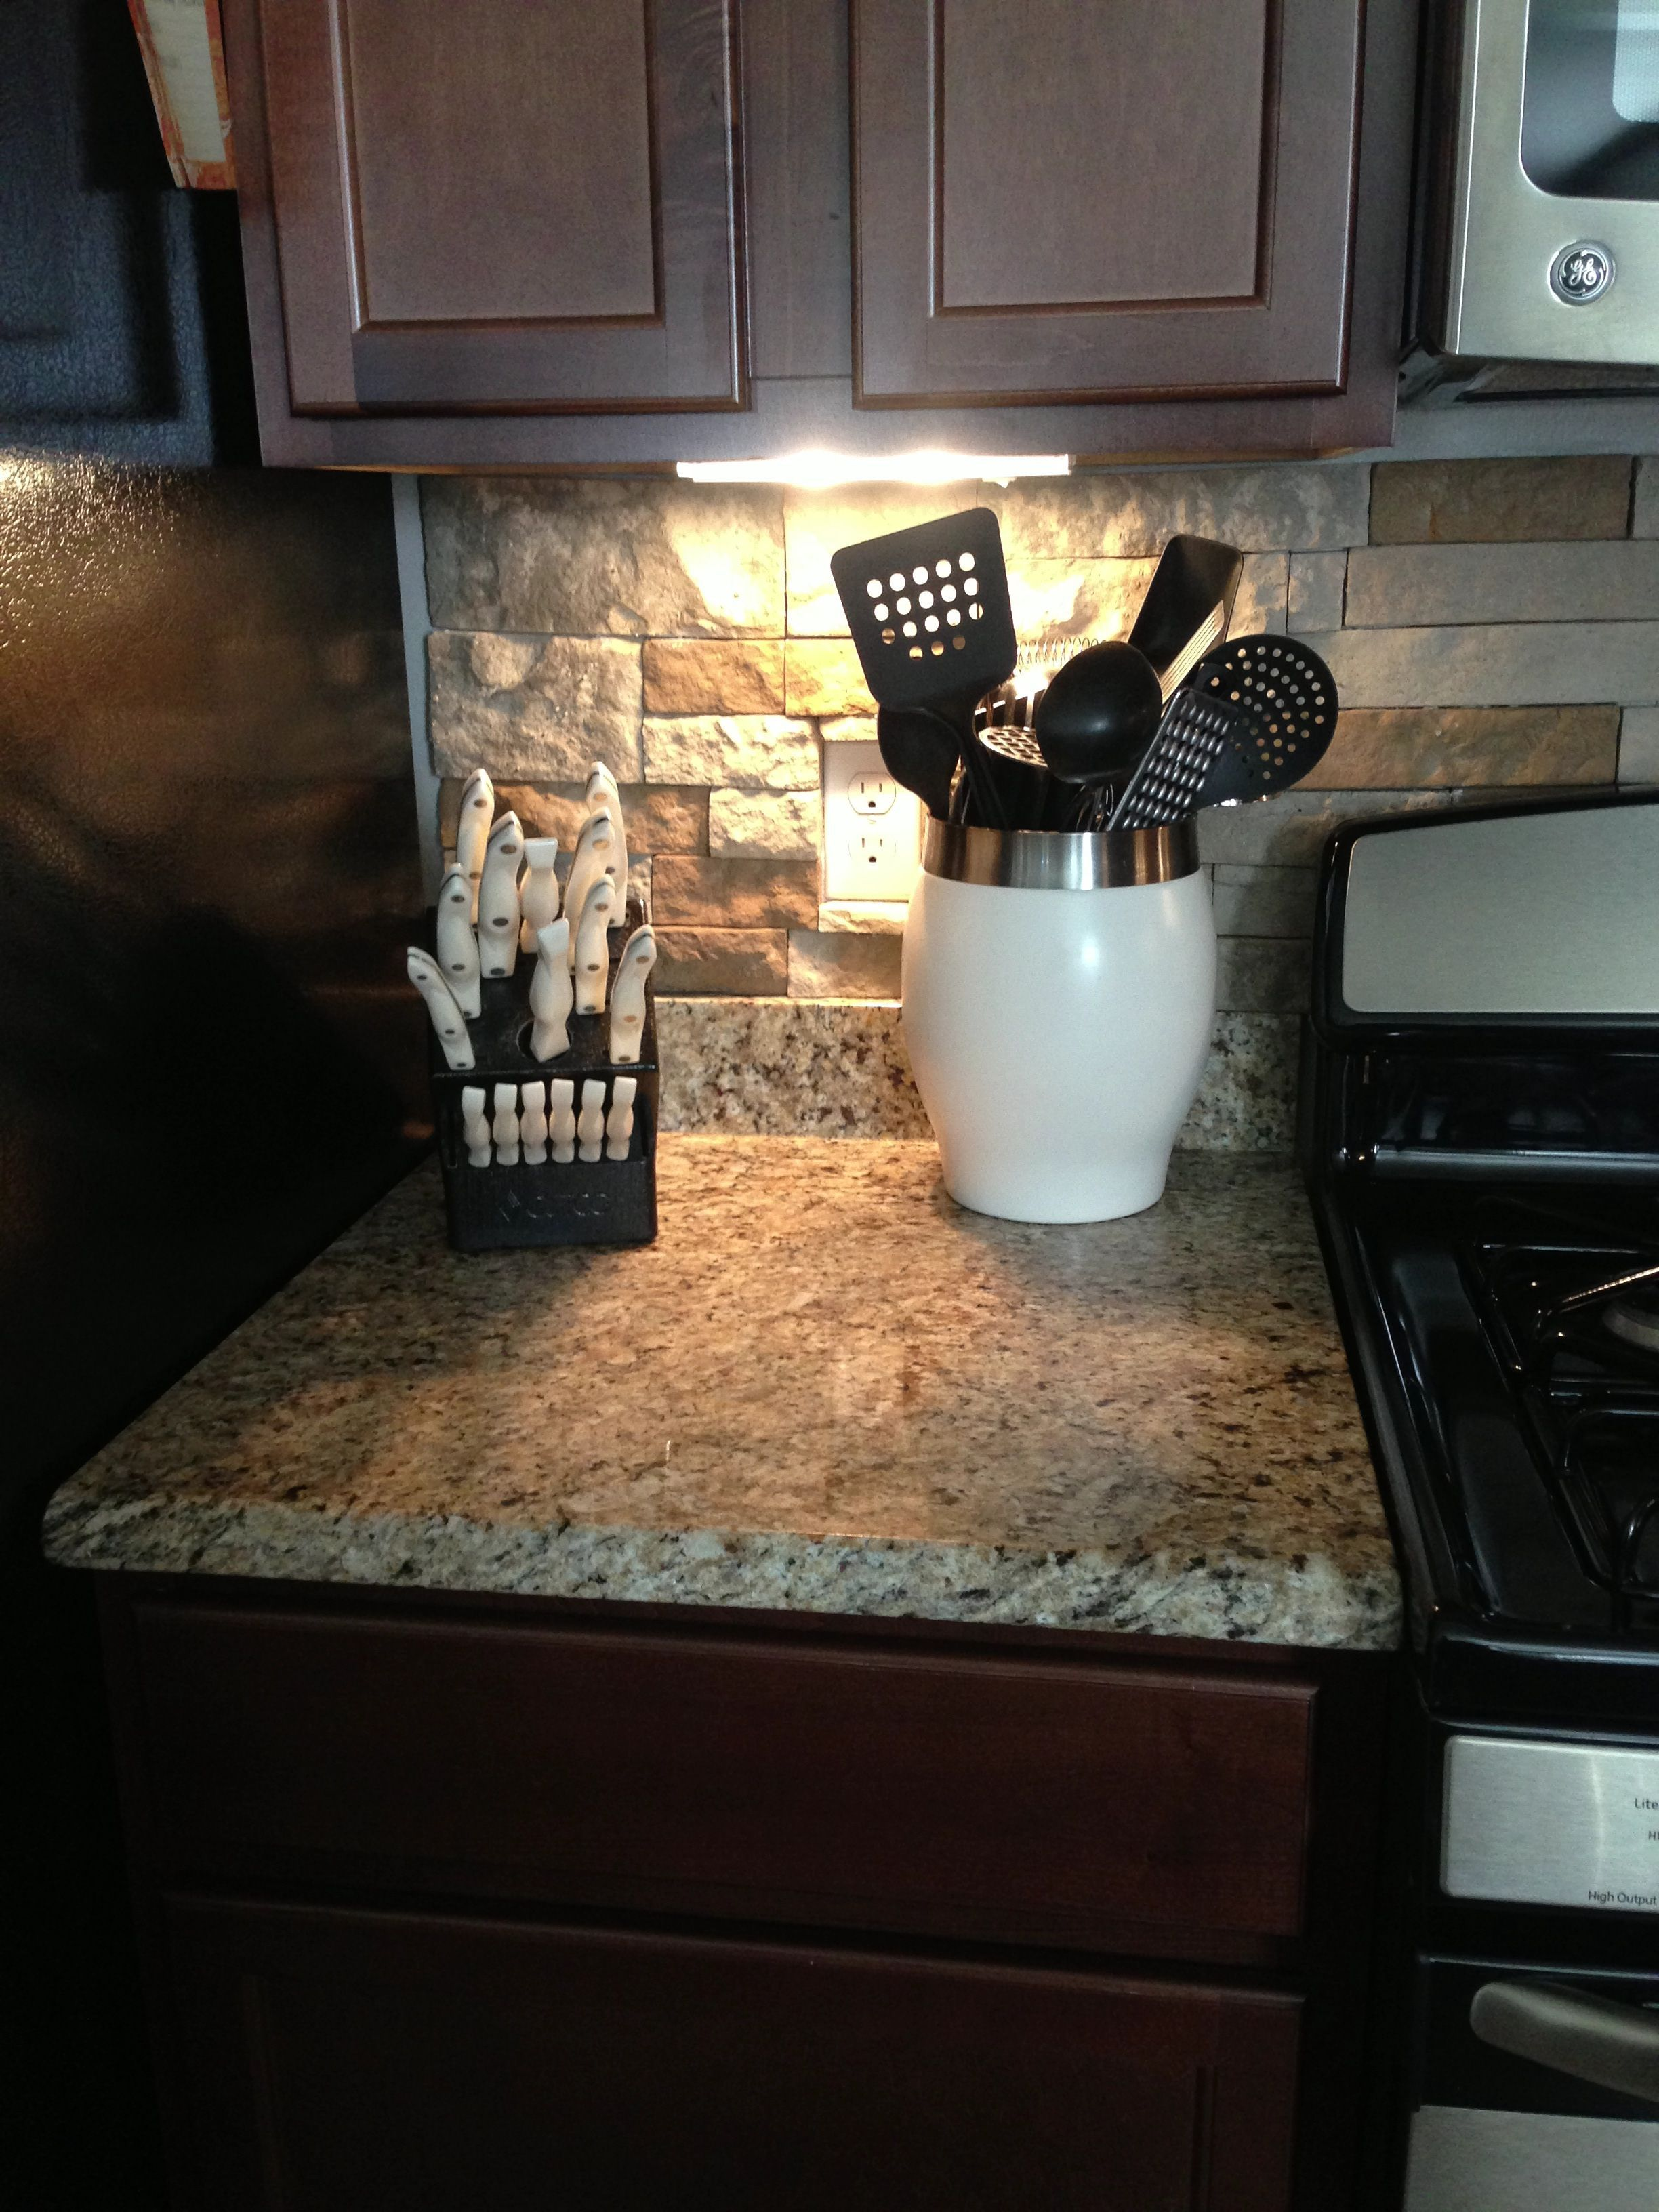 - 6 Outstanding Kitchen Backsplash Ideas That Make You Feel Like A  Professional Chef Backsplash With Dark Cabinets, Backsplash Kitchen Dark  Cabinets, Kitchen Cabinets And Backsplash